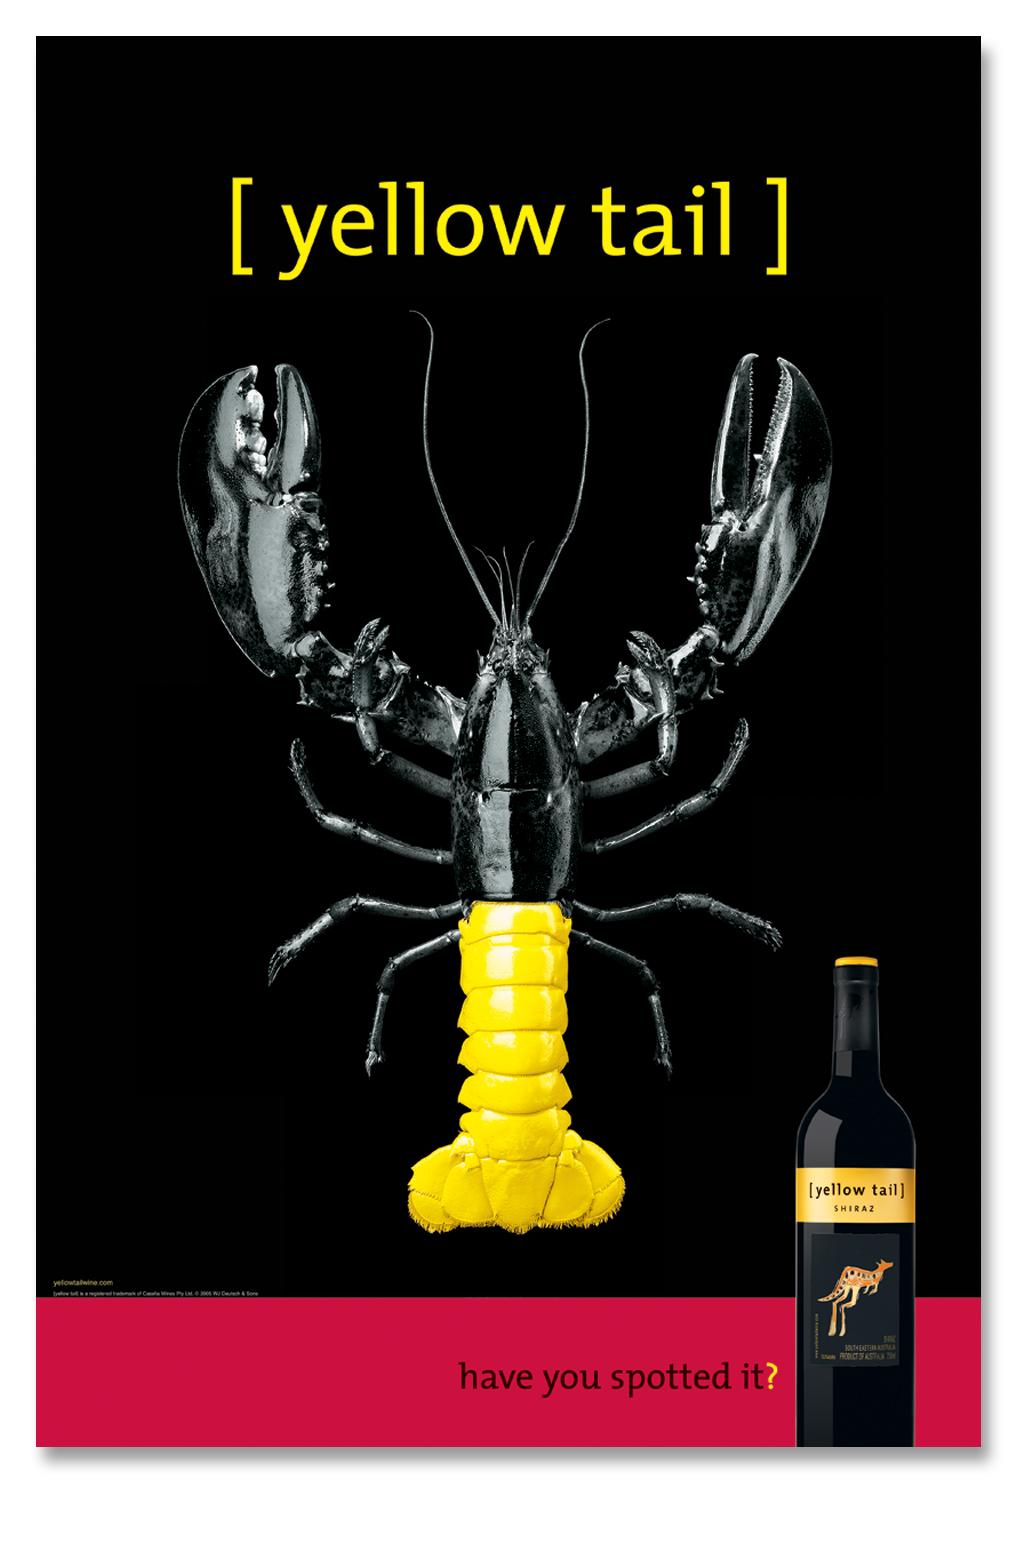 yellowtail_poster_lobster.jpg